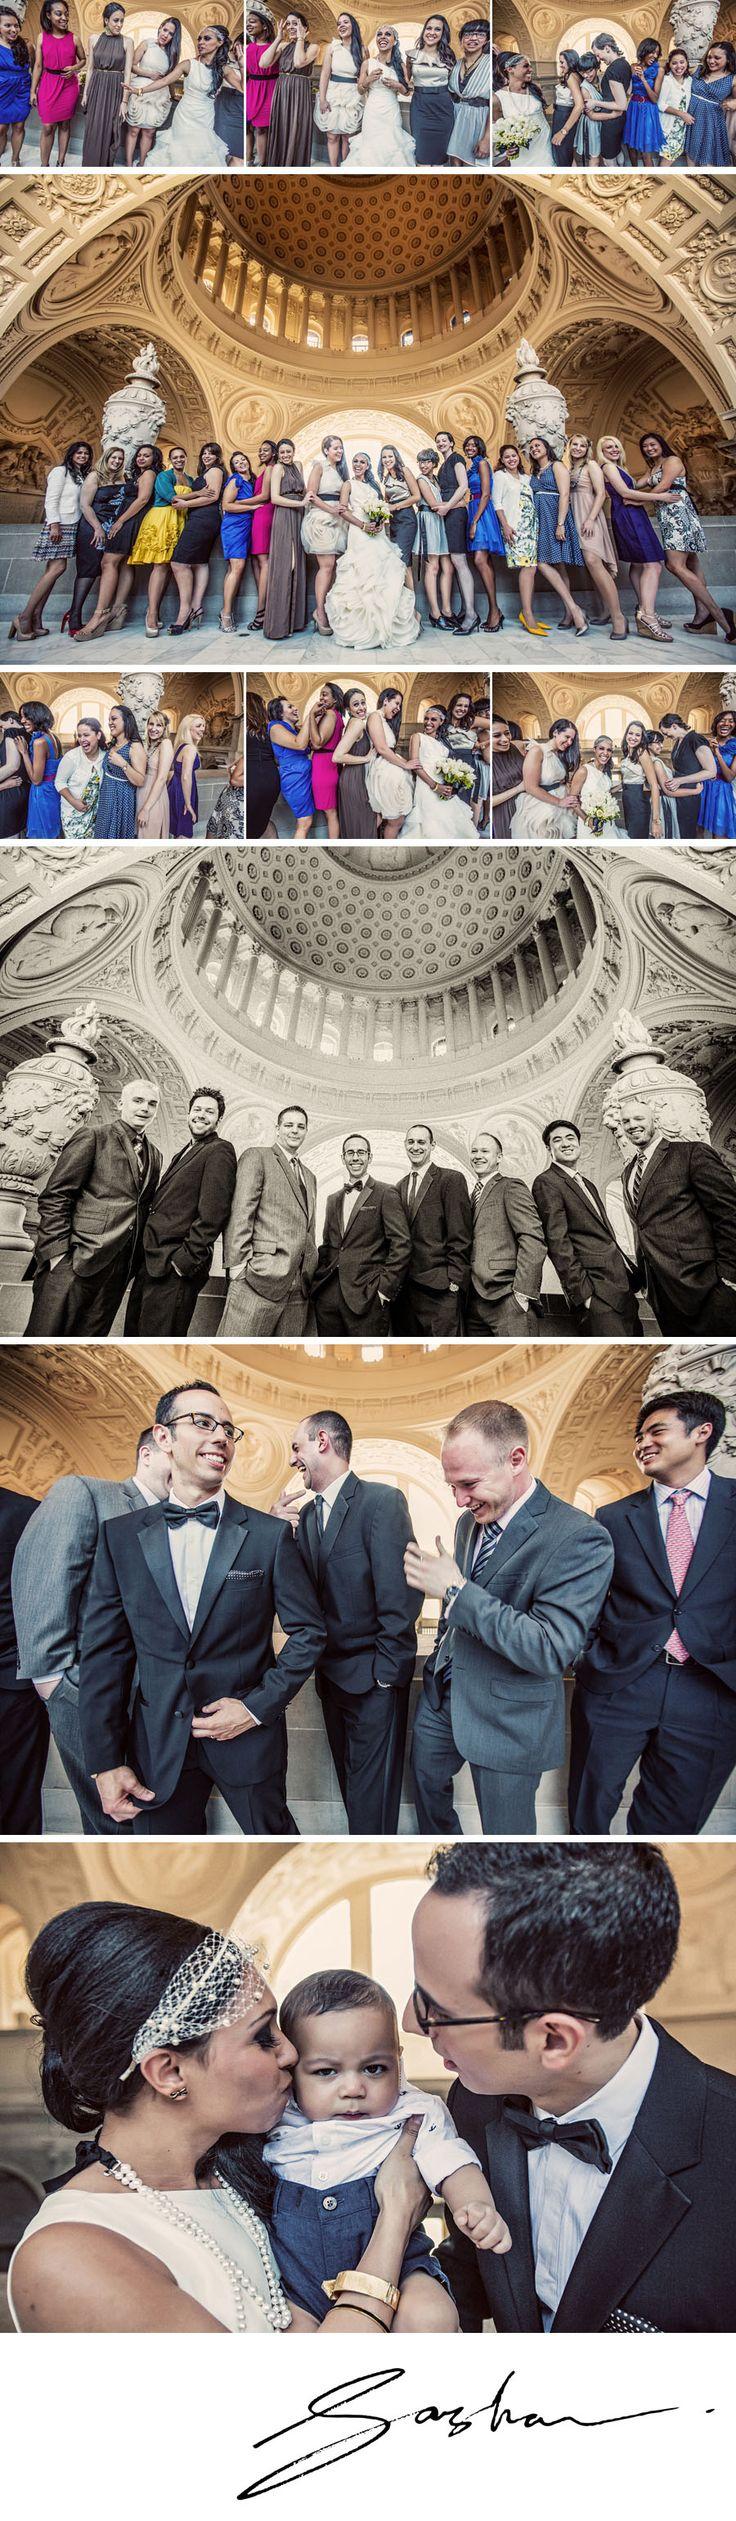 Lily and Jeff's SF City Hall wedding - fun portraits!!